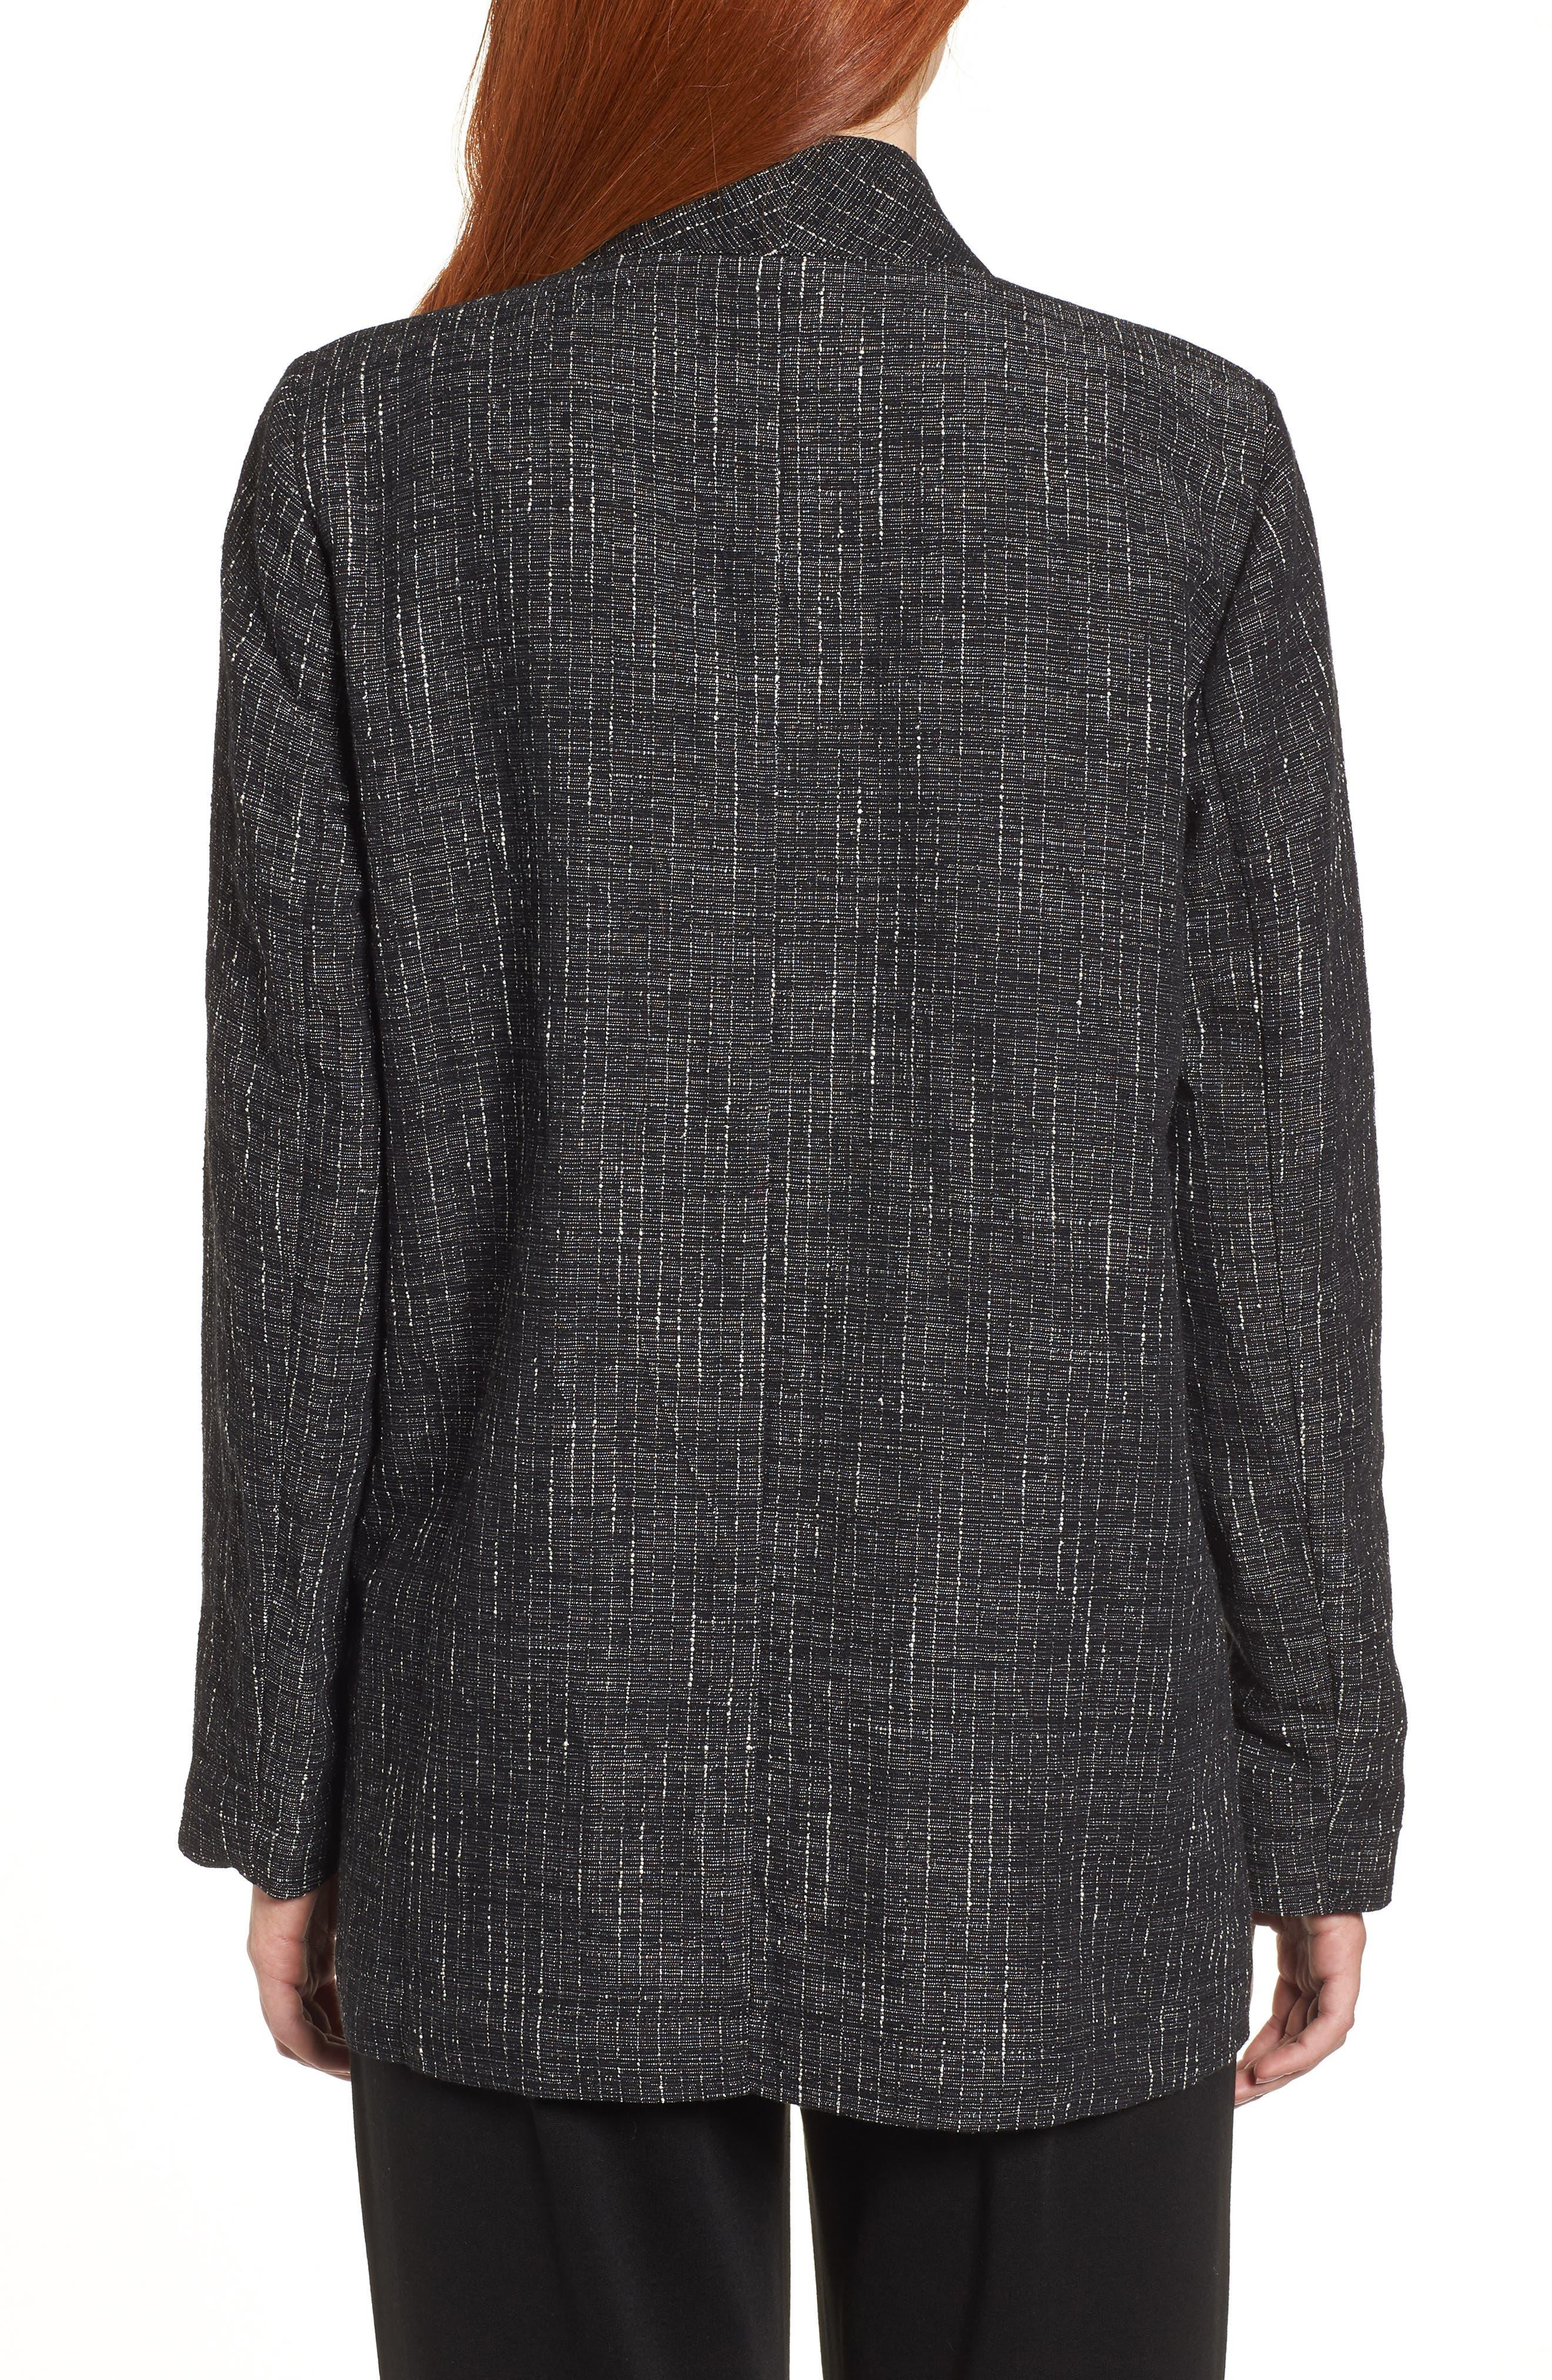 Stand Collar Kimono Jacket,                             Alternate thumbnail 2, color,                             Black